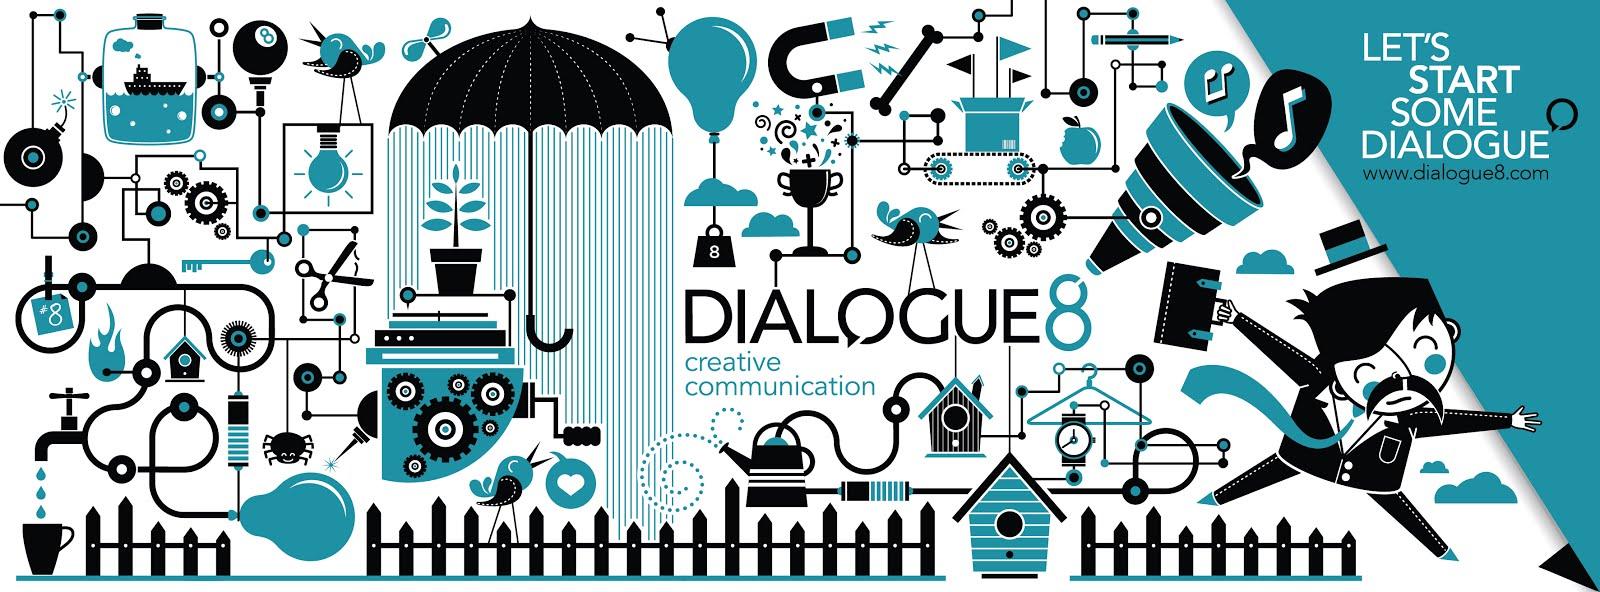 Dialogue8 Blog - by Dialogue8 Creative Communication